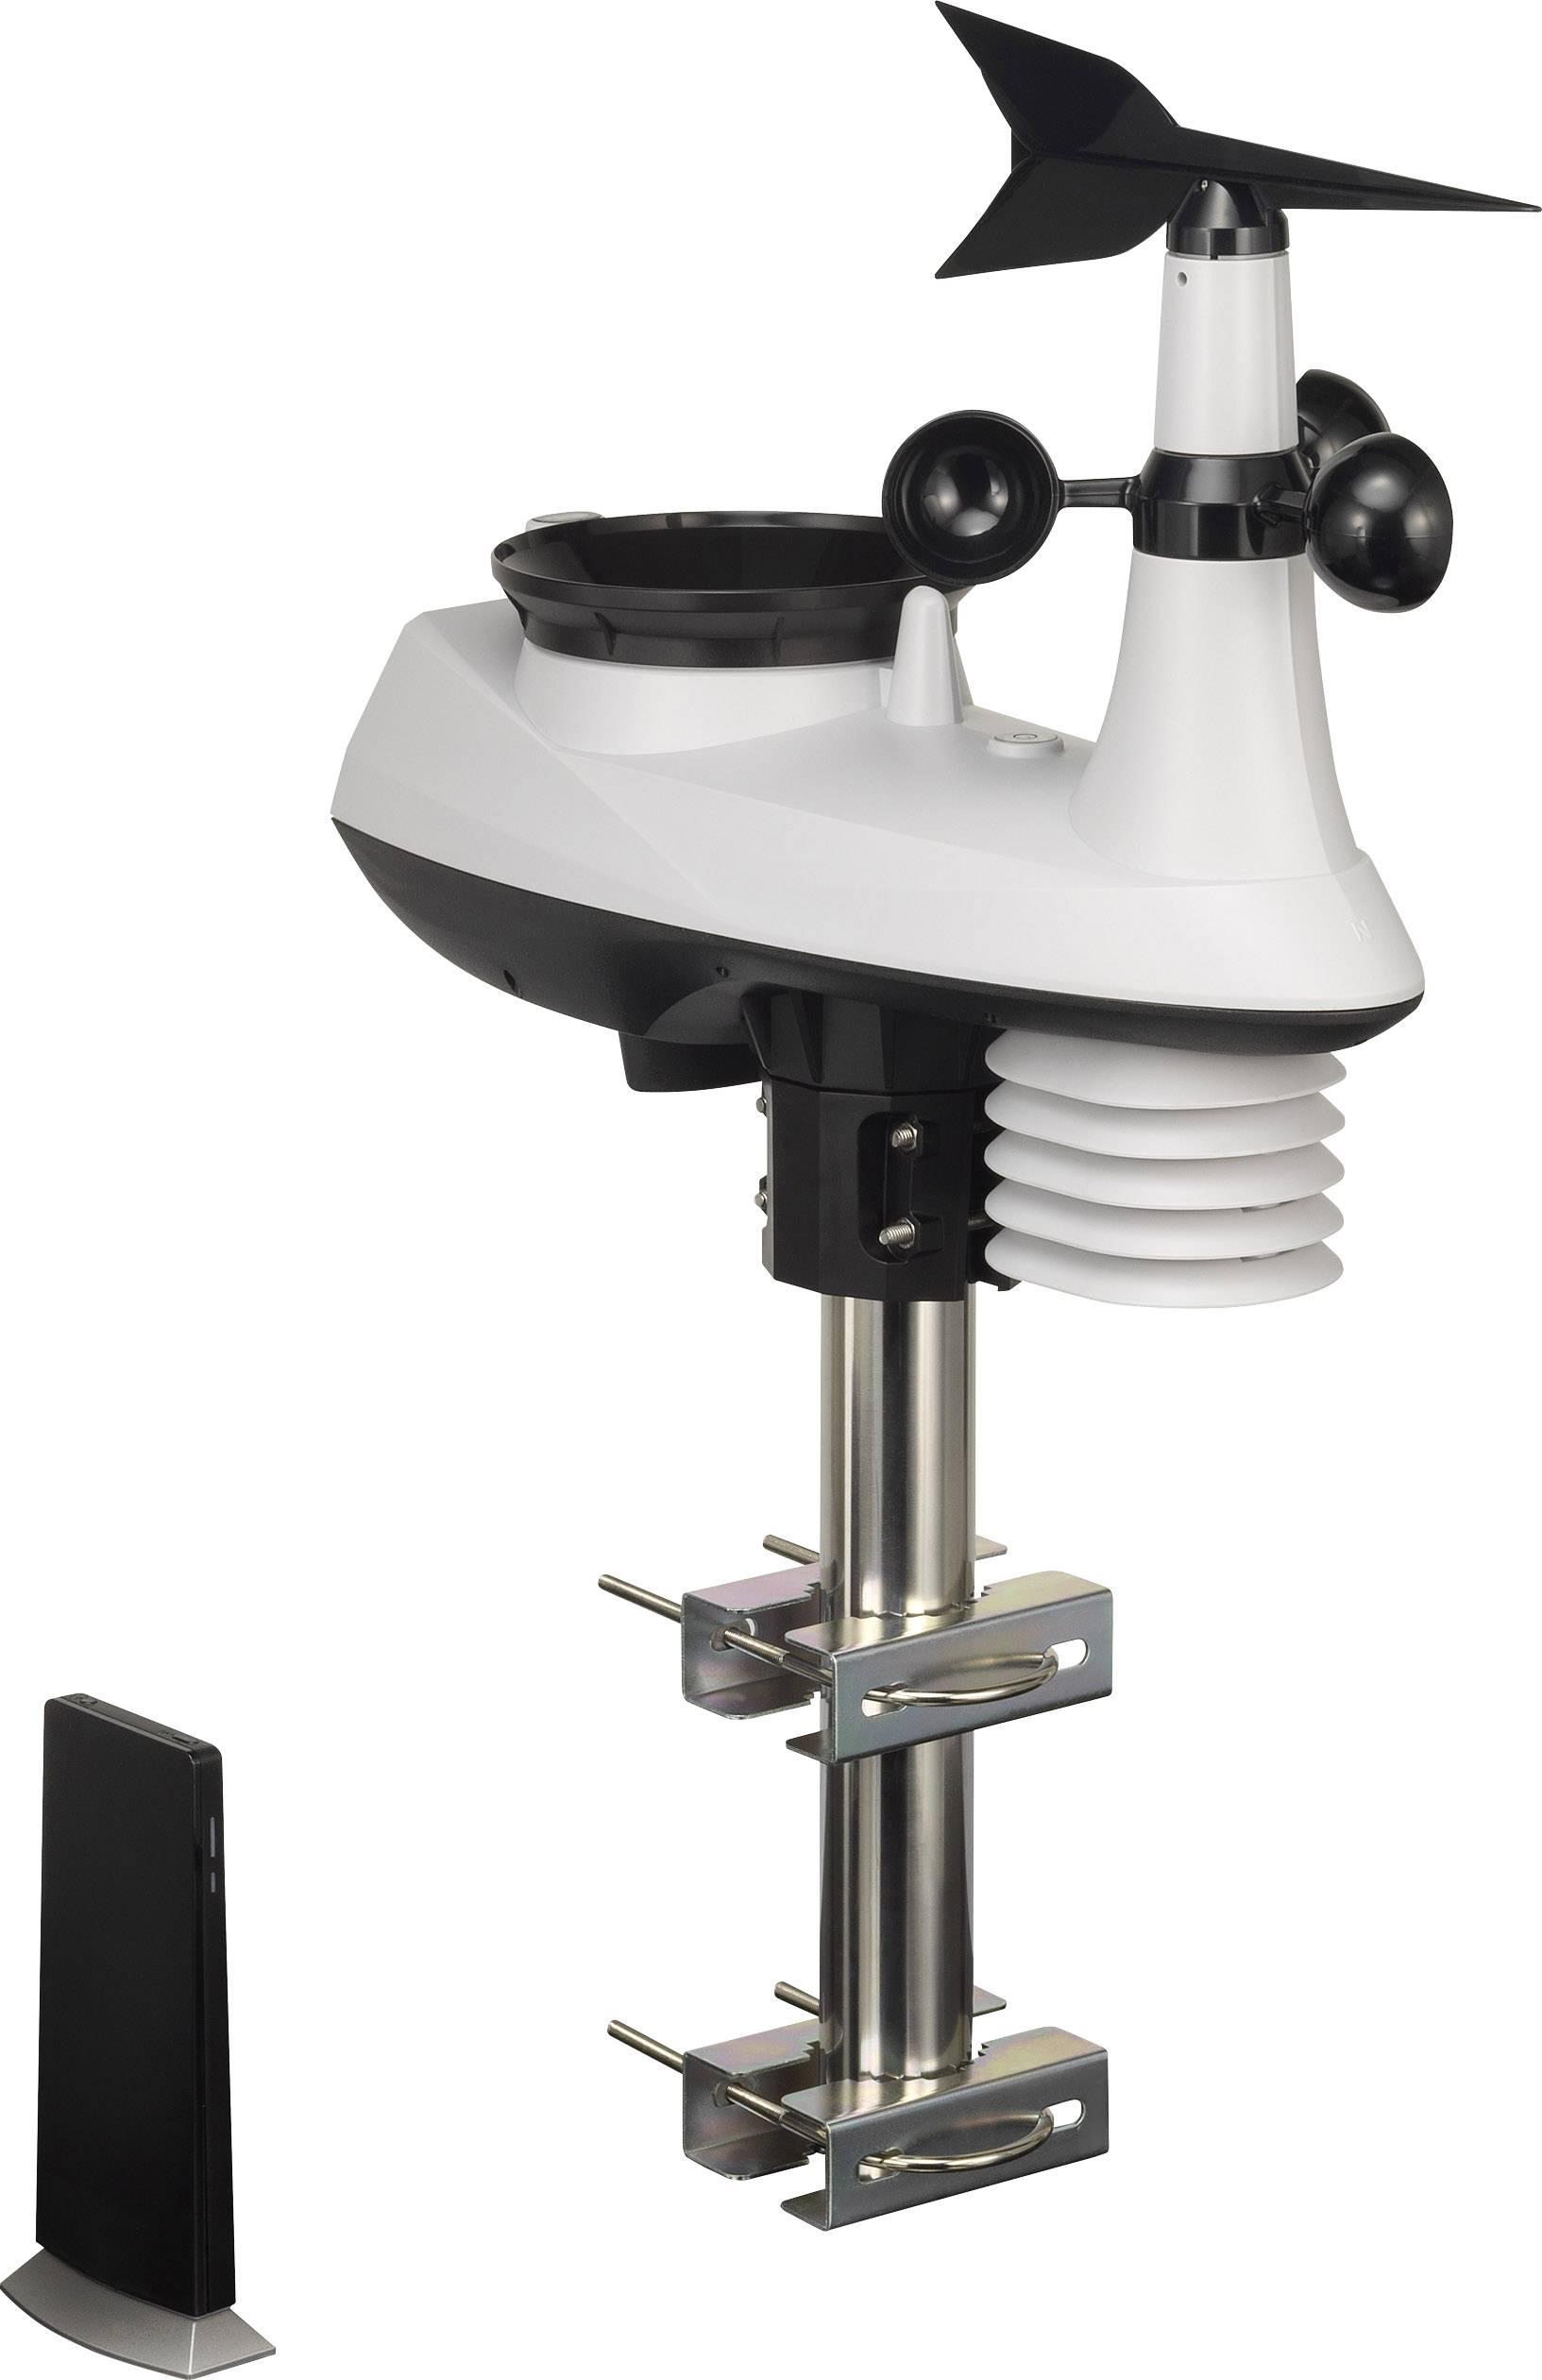 Internetová meteostanice Eurochron EIWS 1 EC-3123694, Max. dosah 150 m, černá